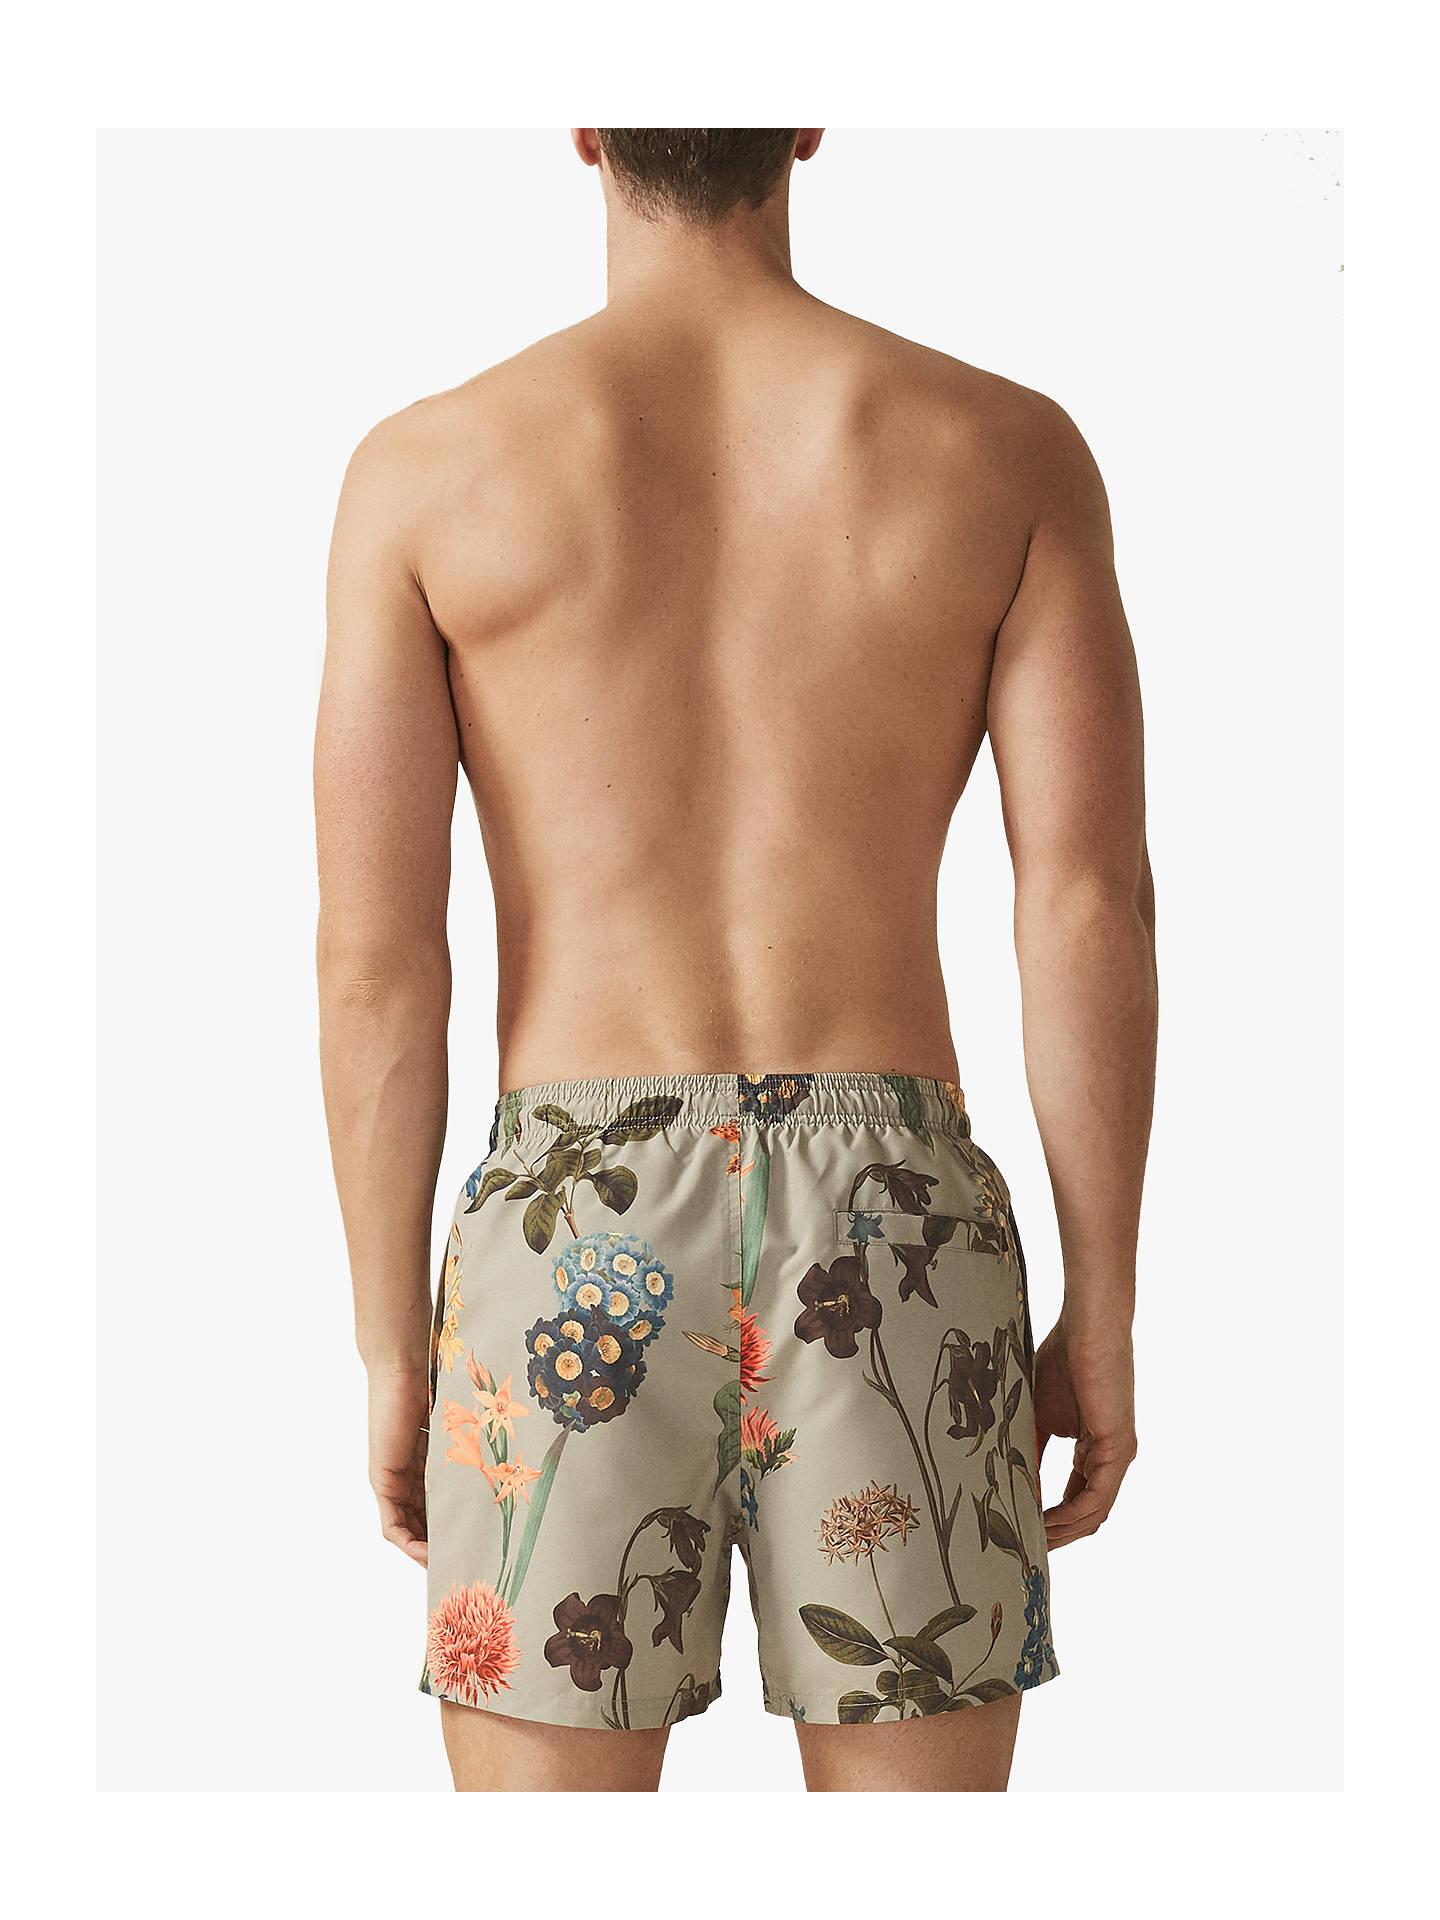 0b4651cfeb2f7 ... Buy Reiss Zimi Floral Print Swim Shorts, Sage, S Online at johnlewis.com